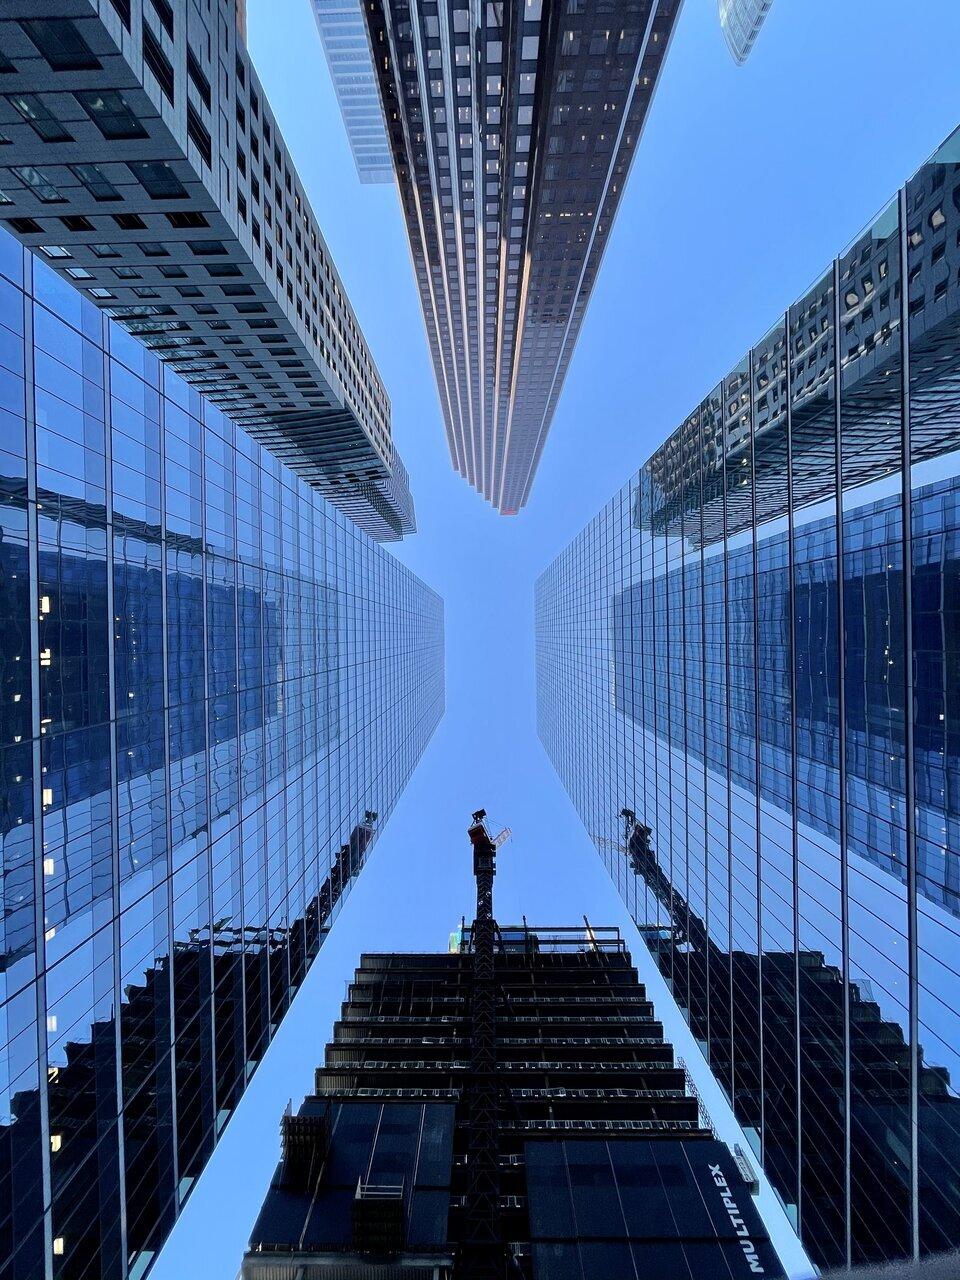 Daily Photo, Toronto, skyline, Downtown, Financial District